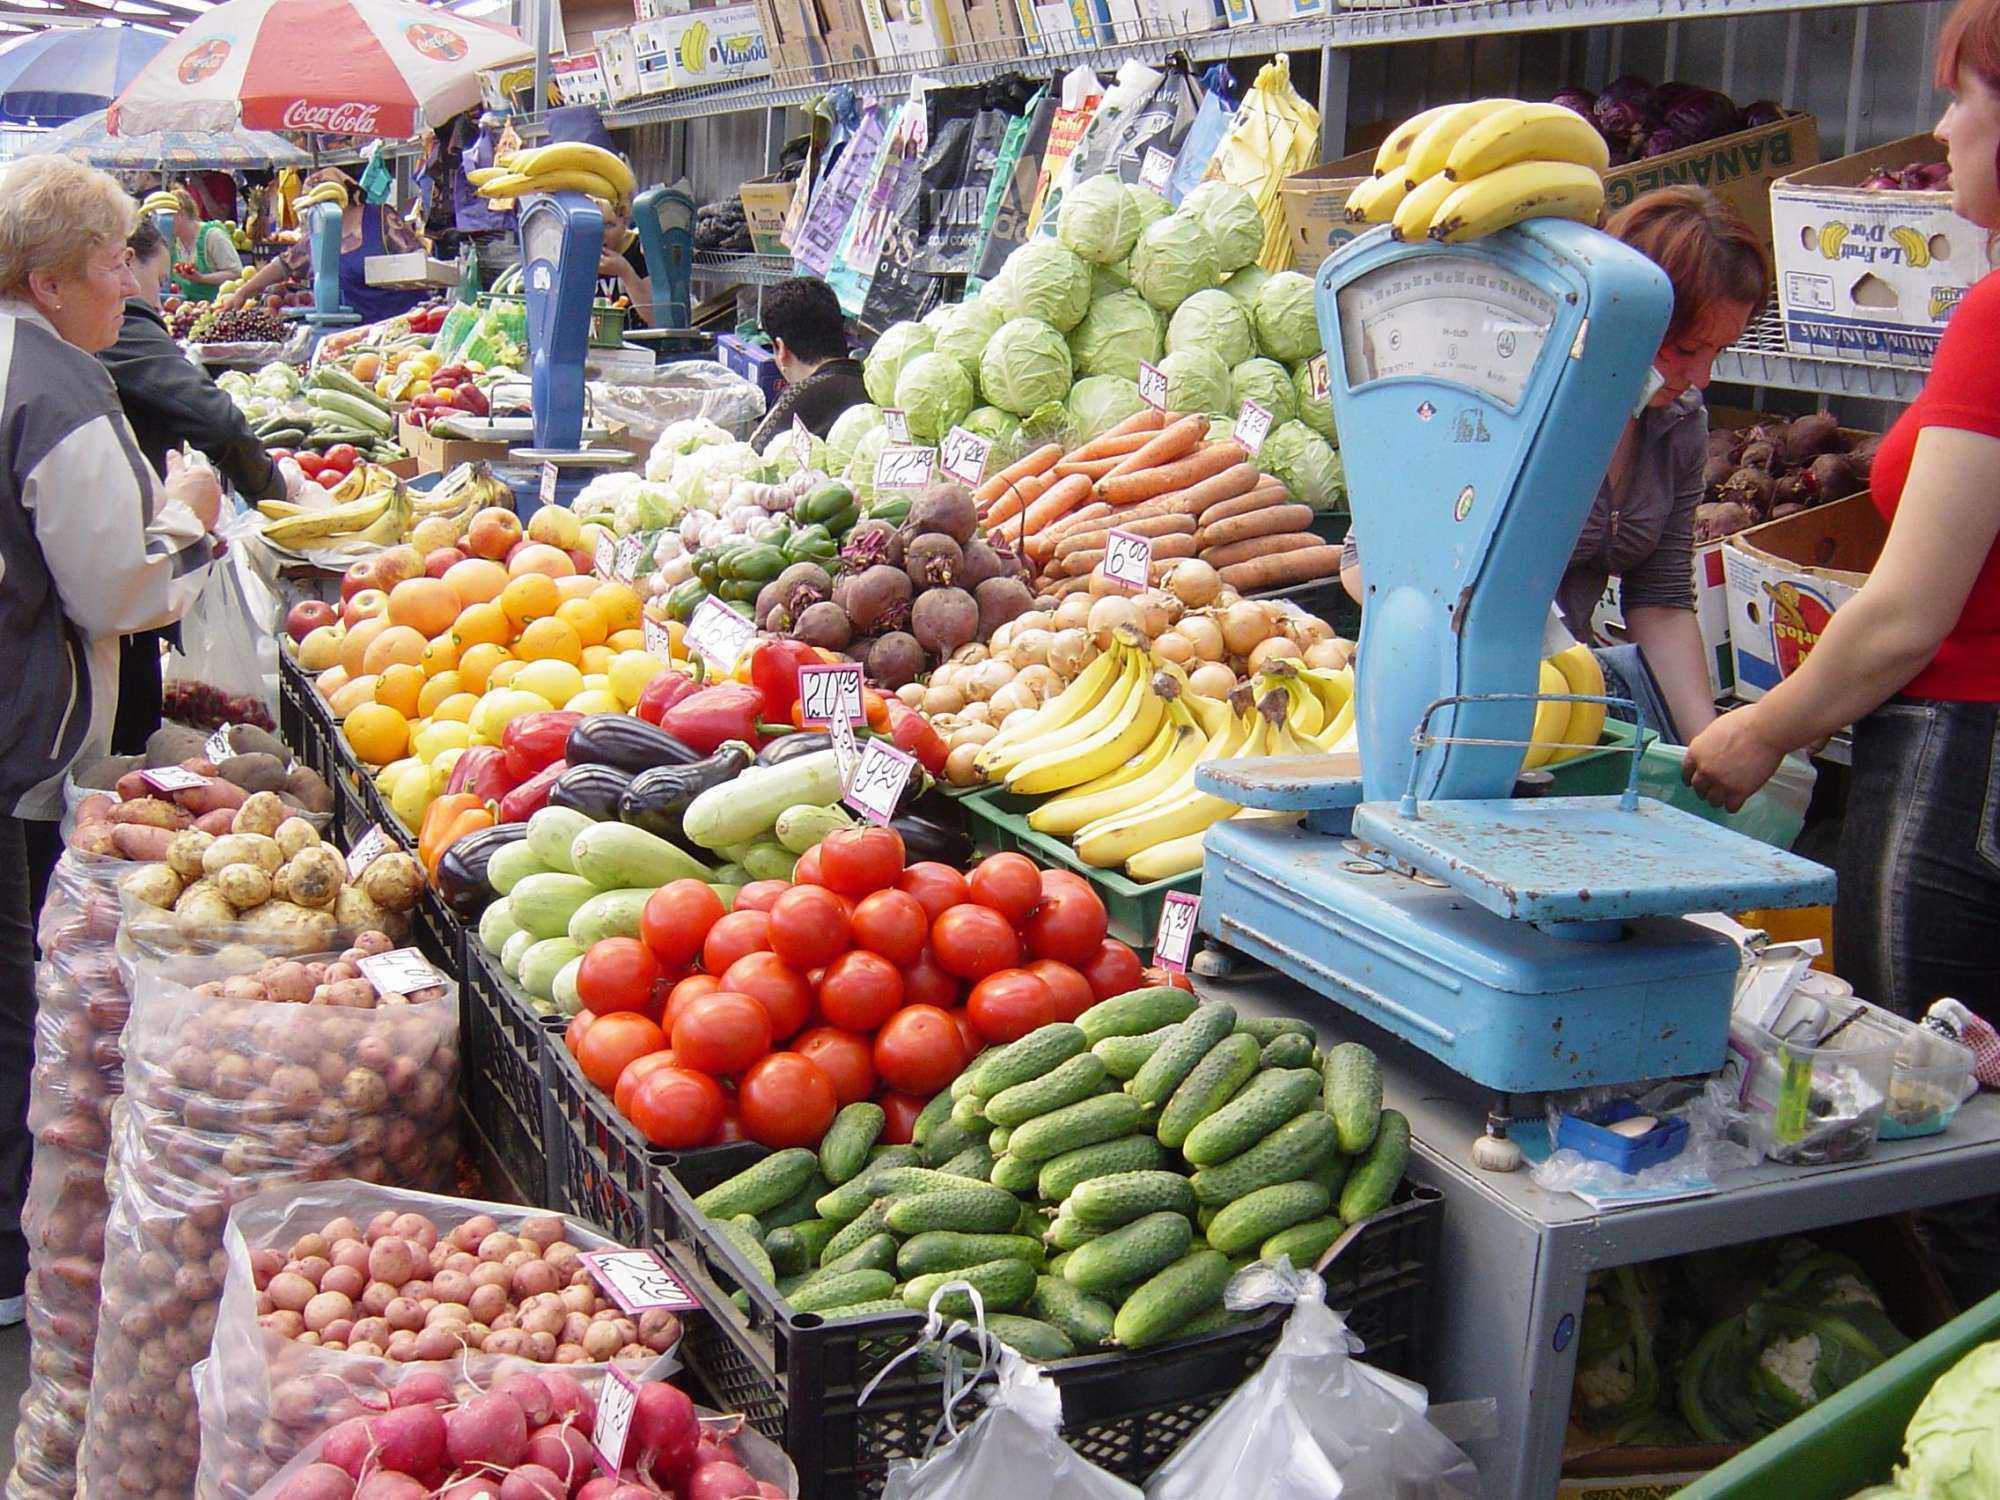 United Fresh, PMA Submit Comments To FDA On Food Safety Modernization Act